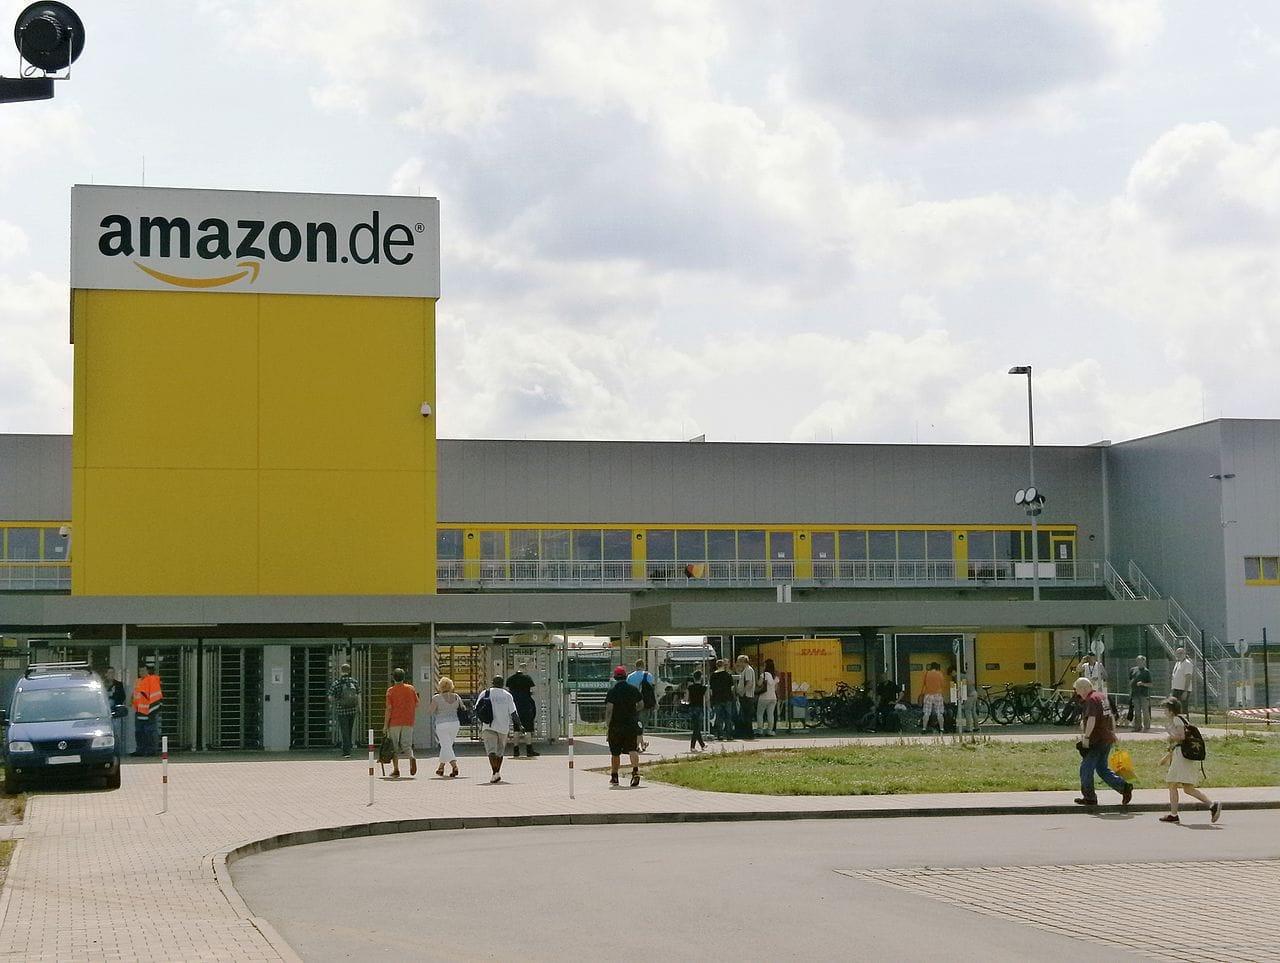 Amazon by blu-news.org Wikimedia Commons